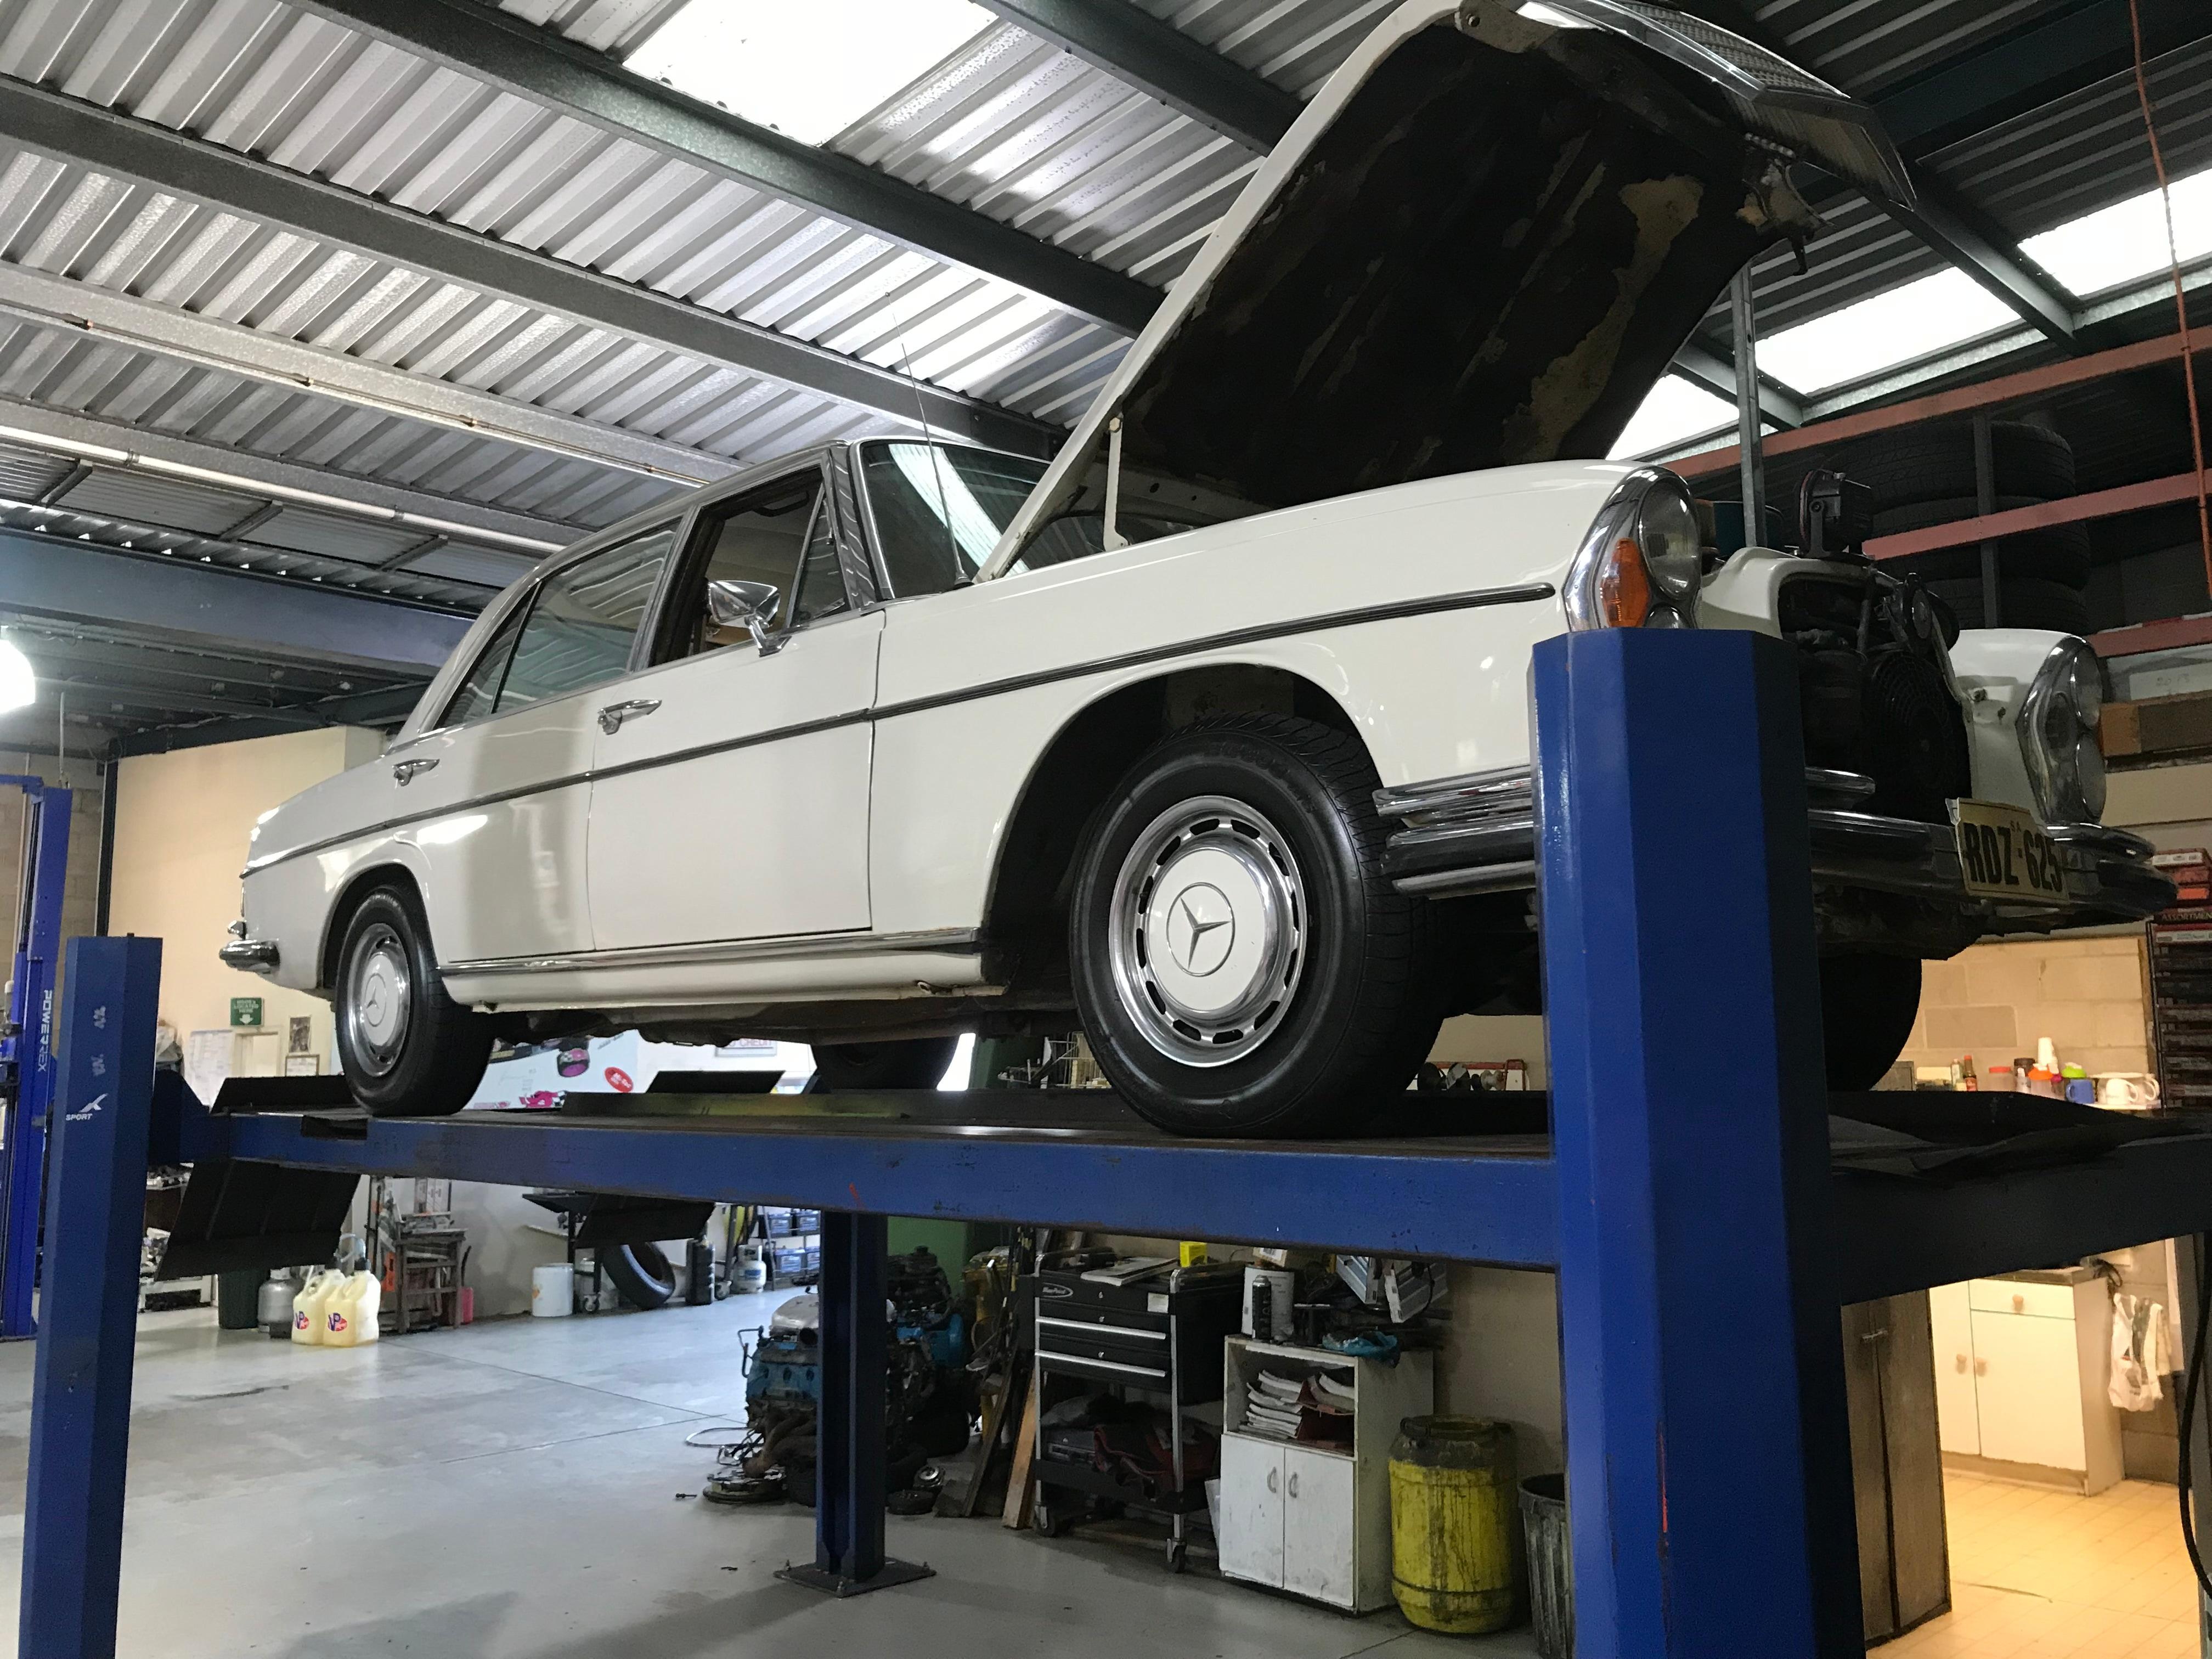 The Workshop Tyre & Mechanical - Mechanics & Motor Engineers